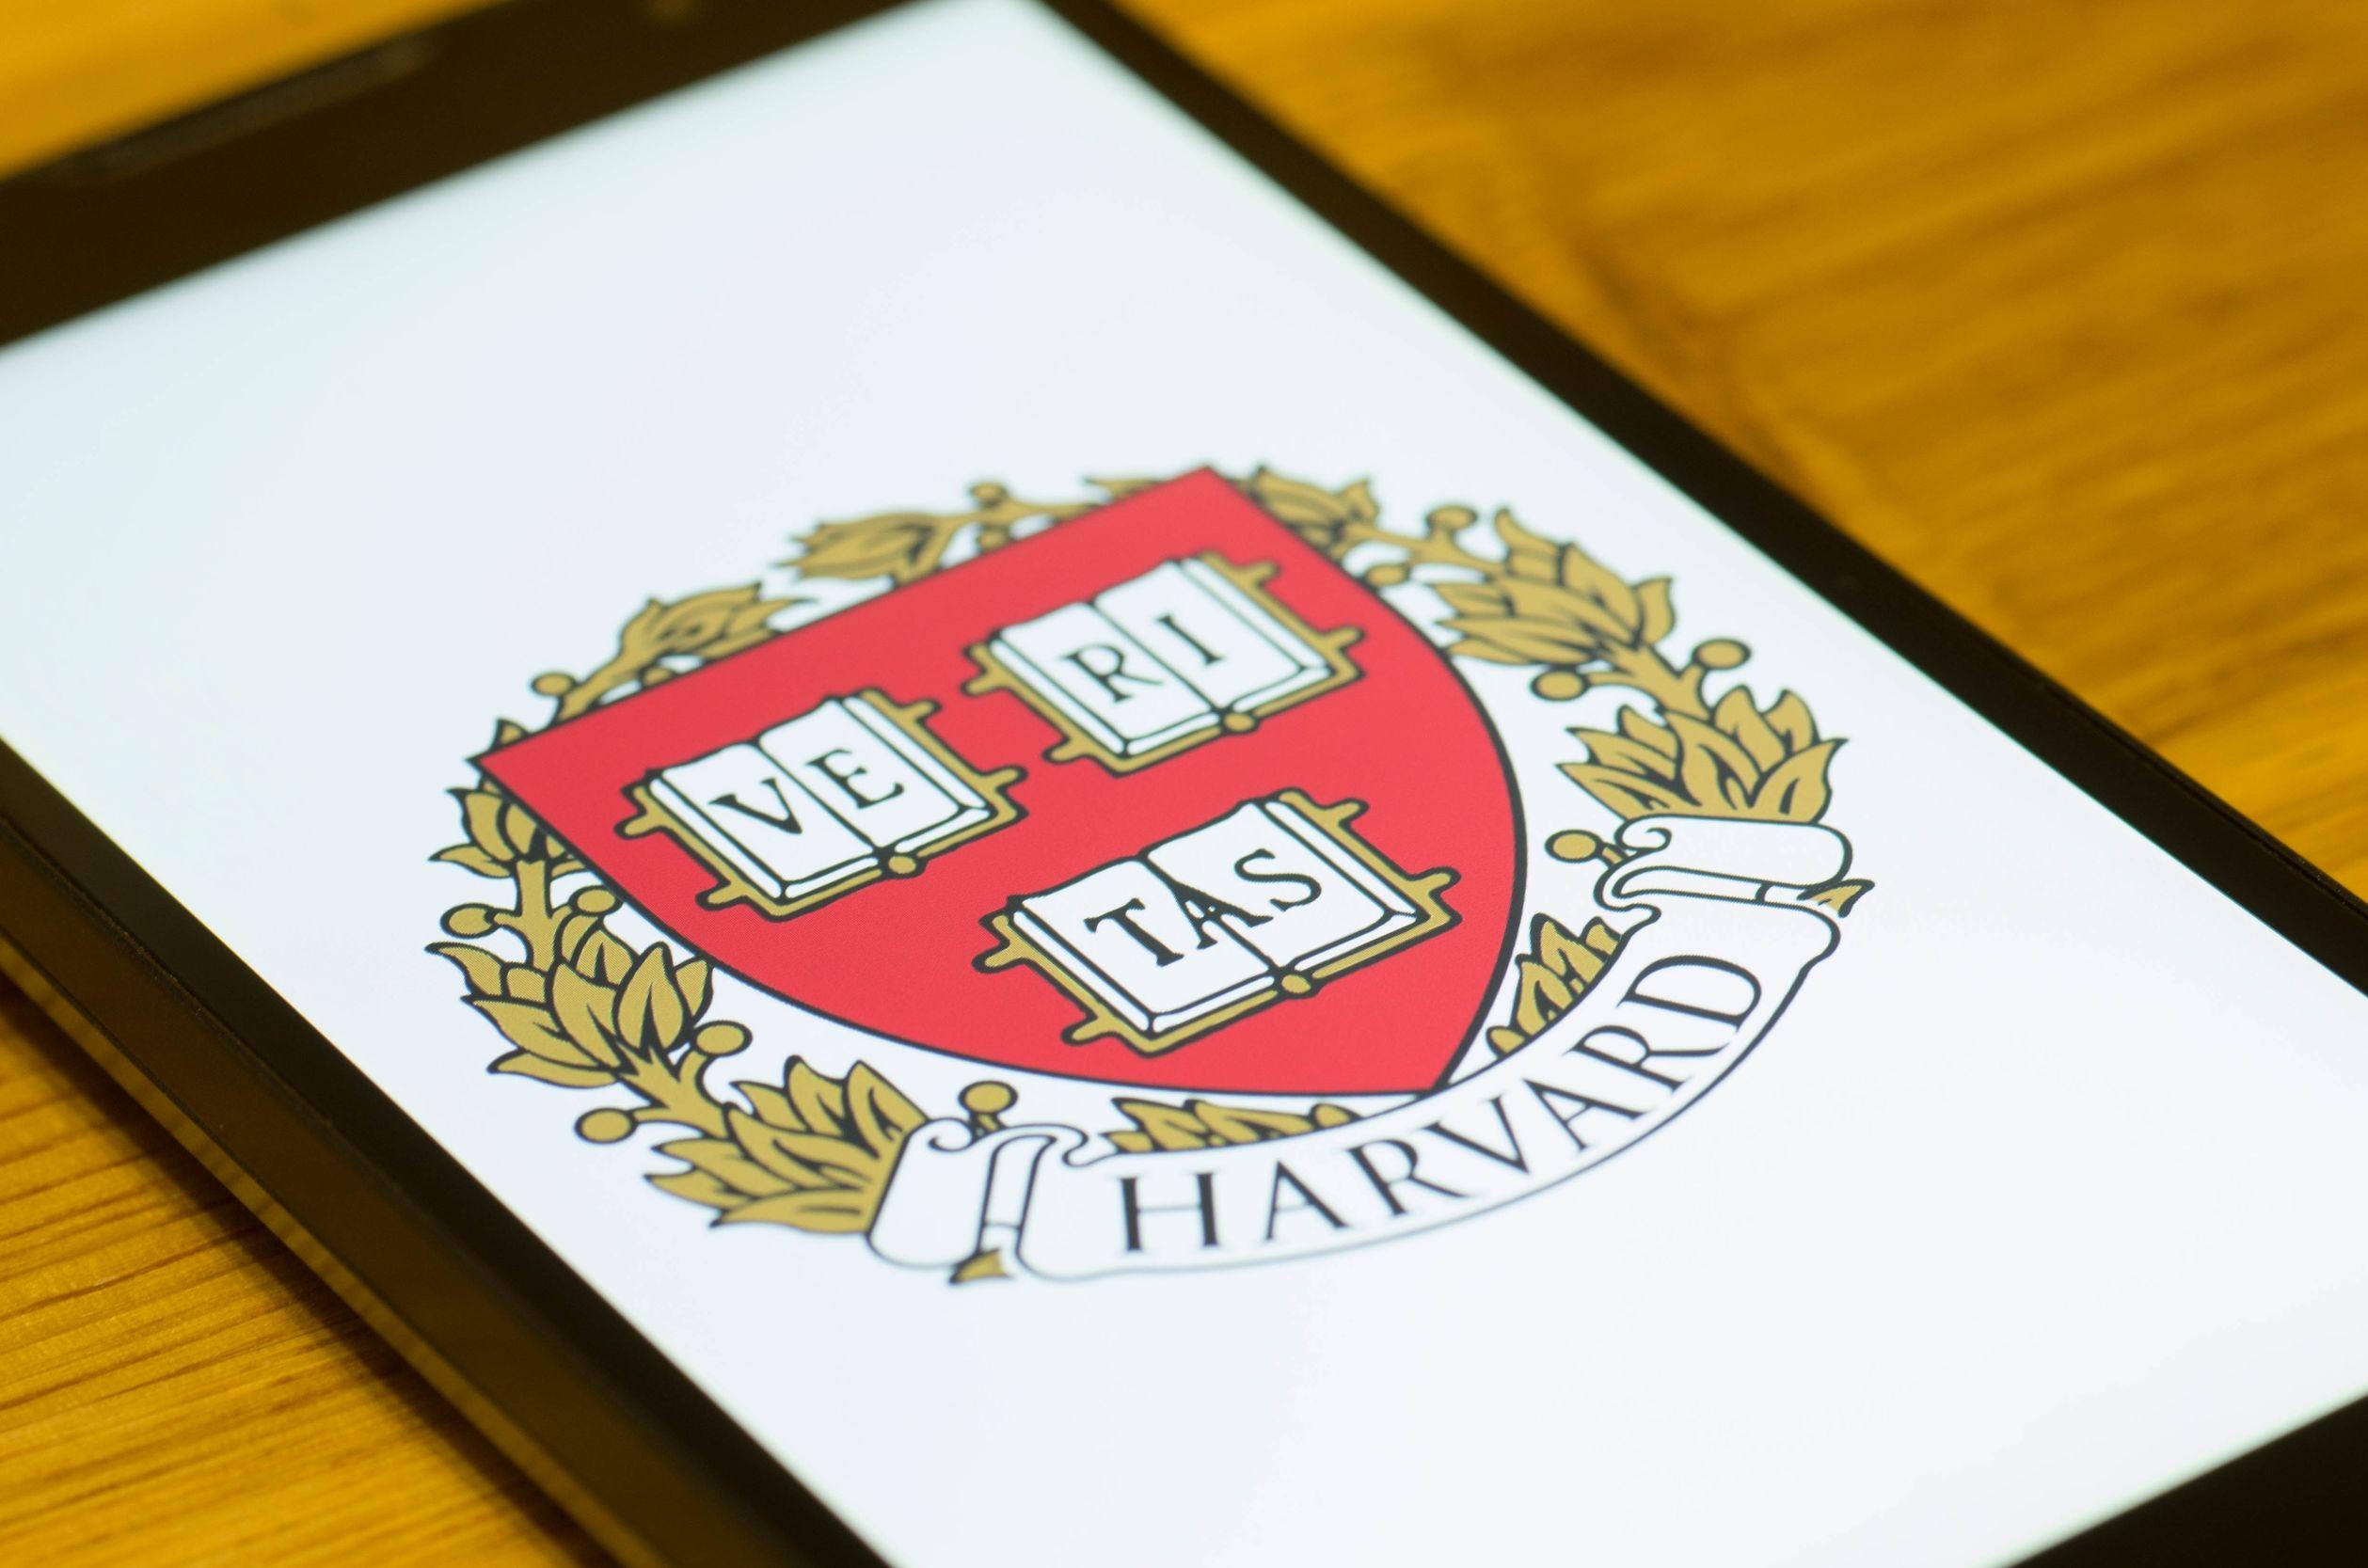 Lema de la Universidad de Harvard